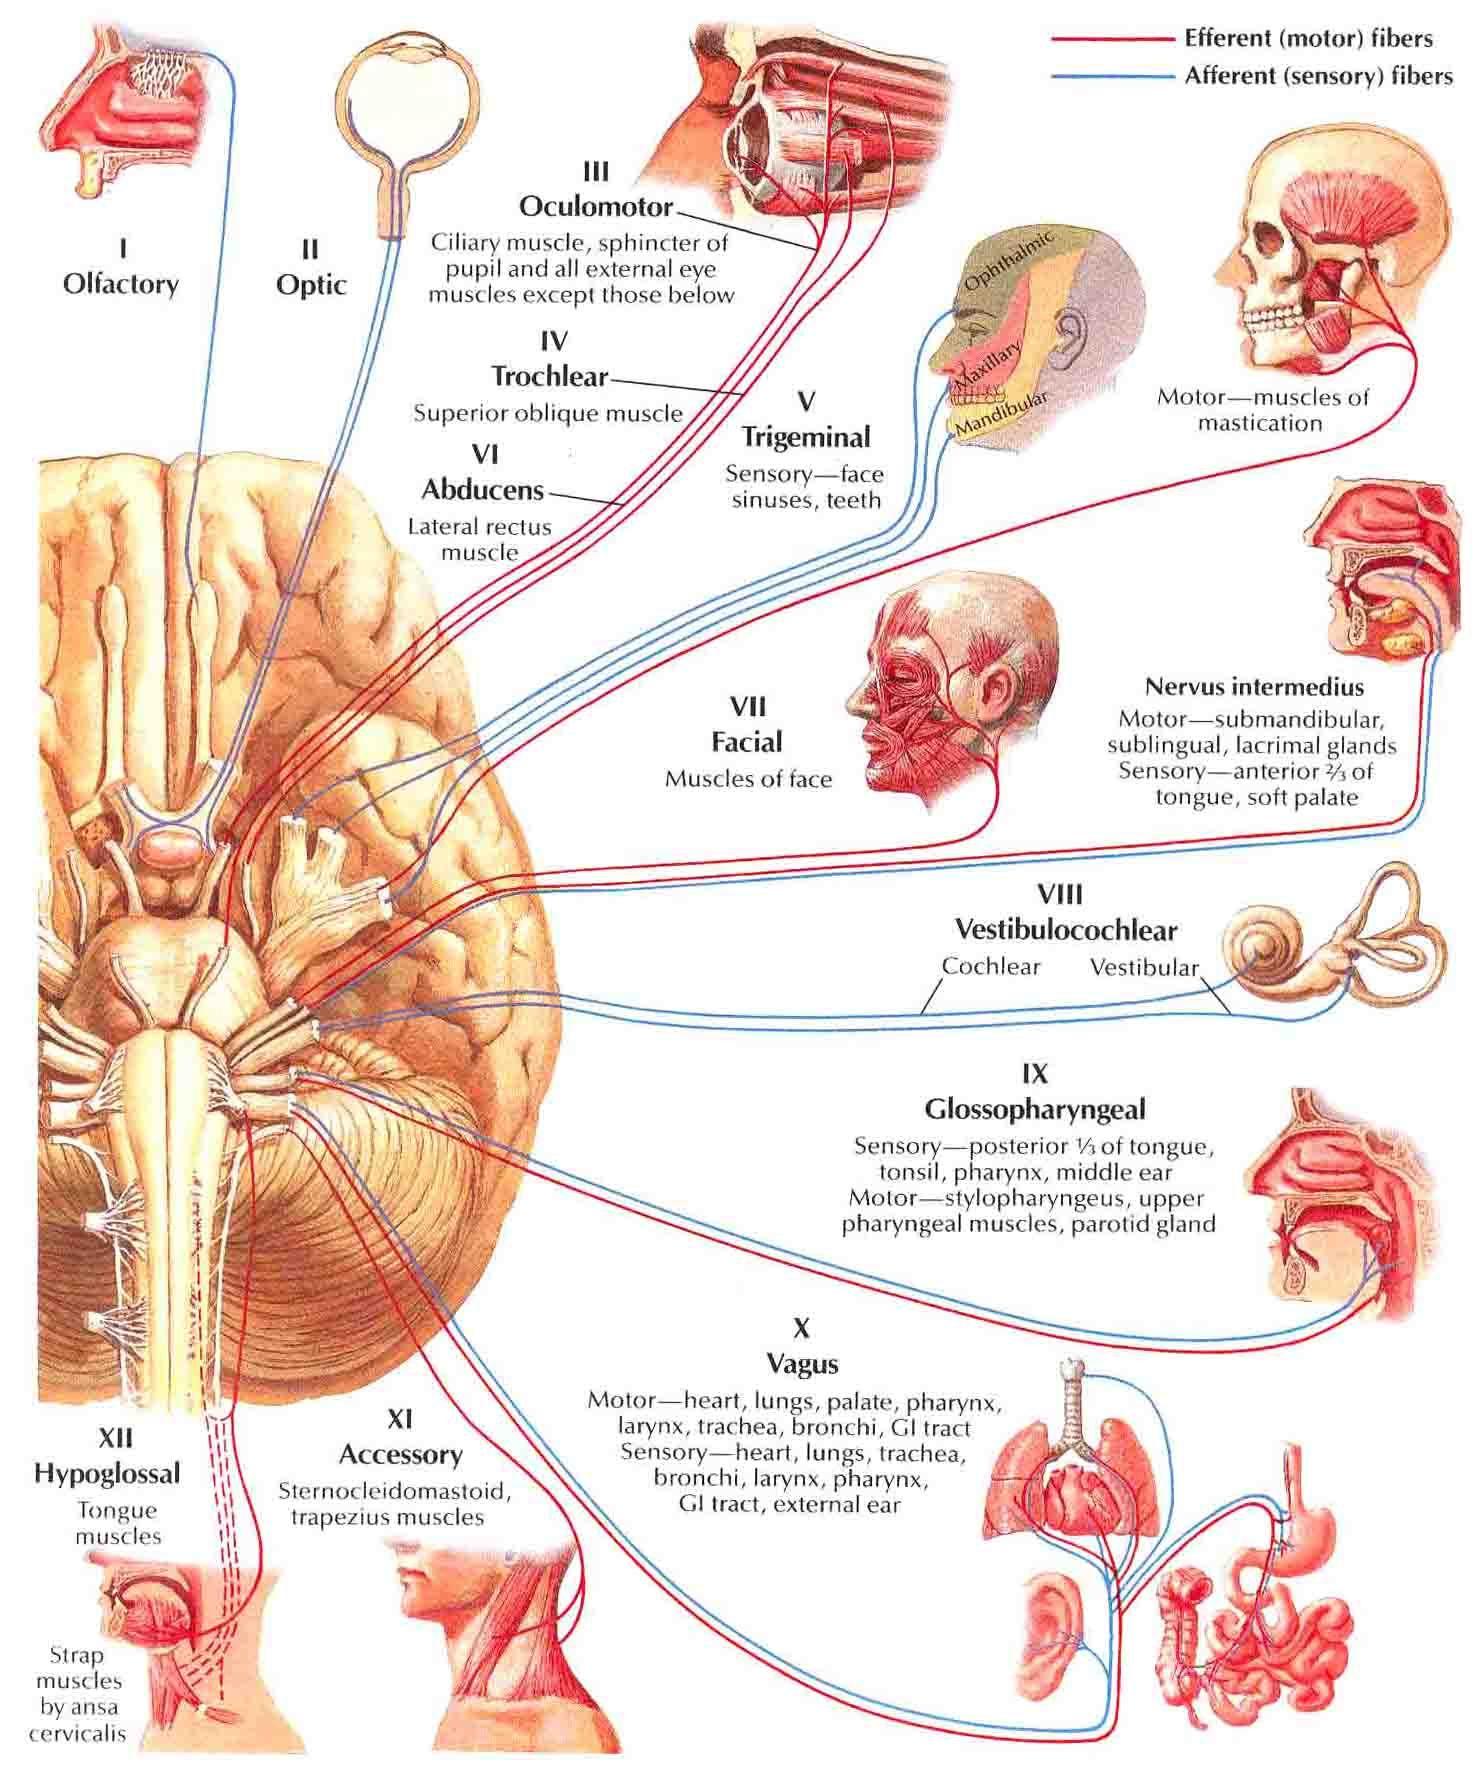 Cranial Nerves (Motor and Sencory Distribution)-Schema   Cranial nerves